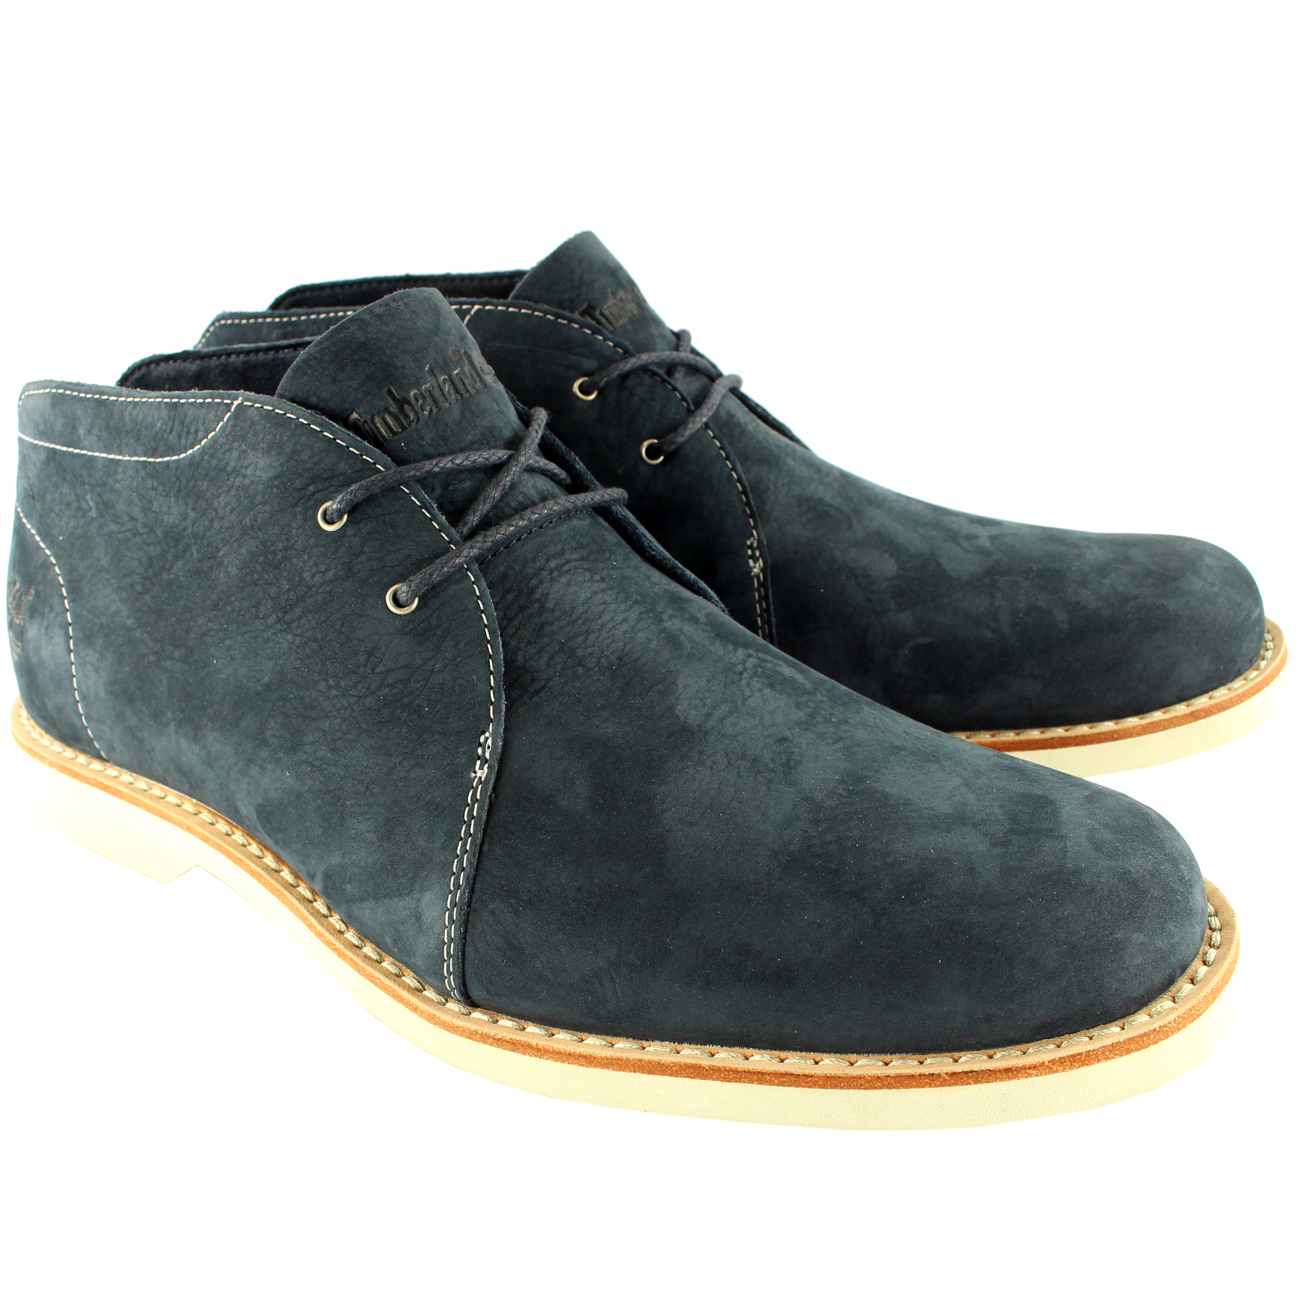 Timberland Stormbuck Lite Chukka Shoes